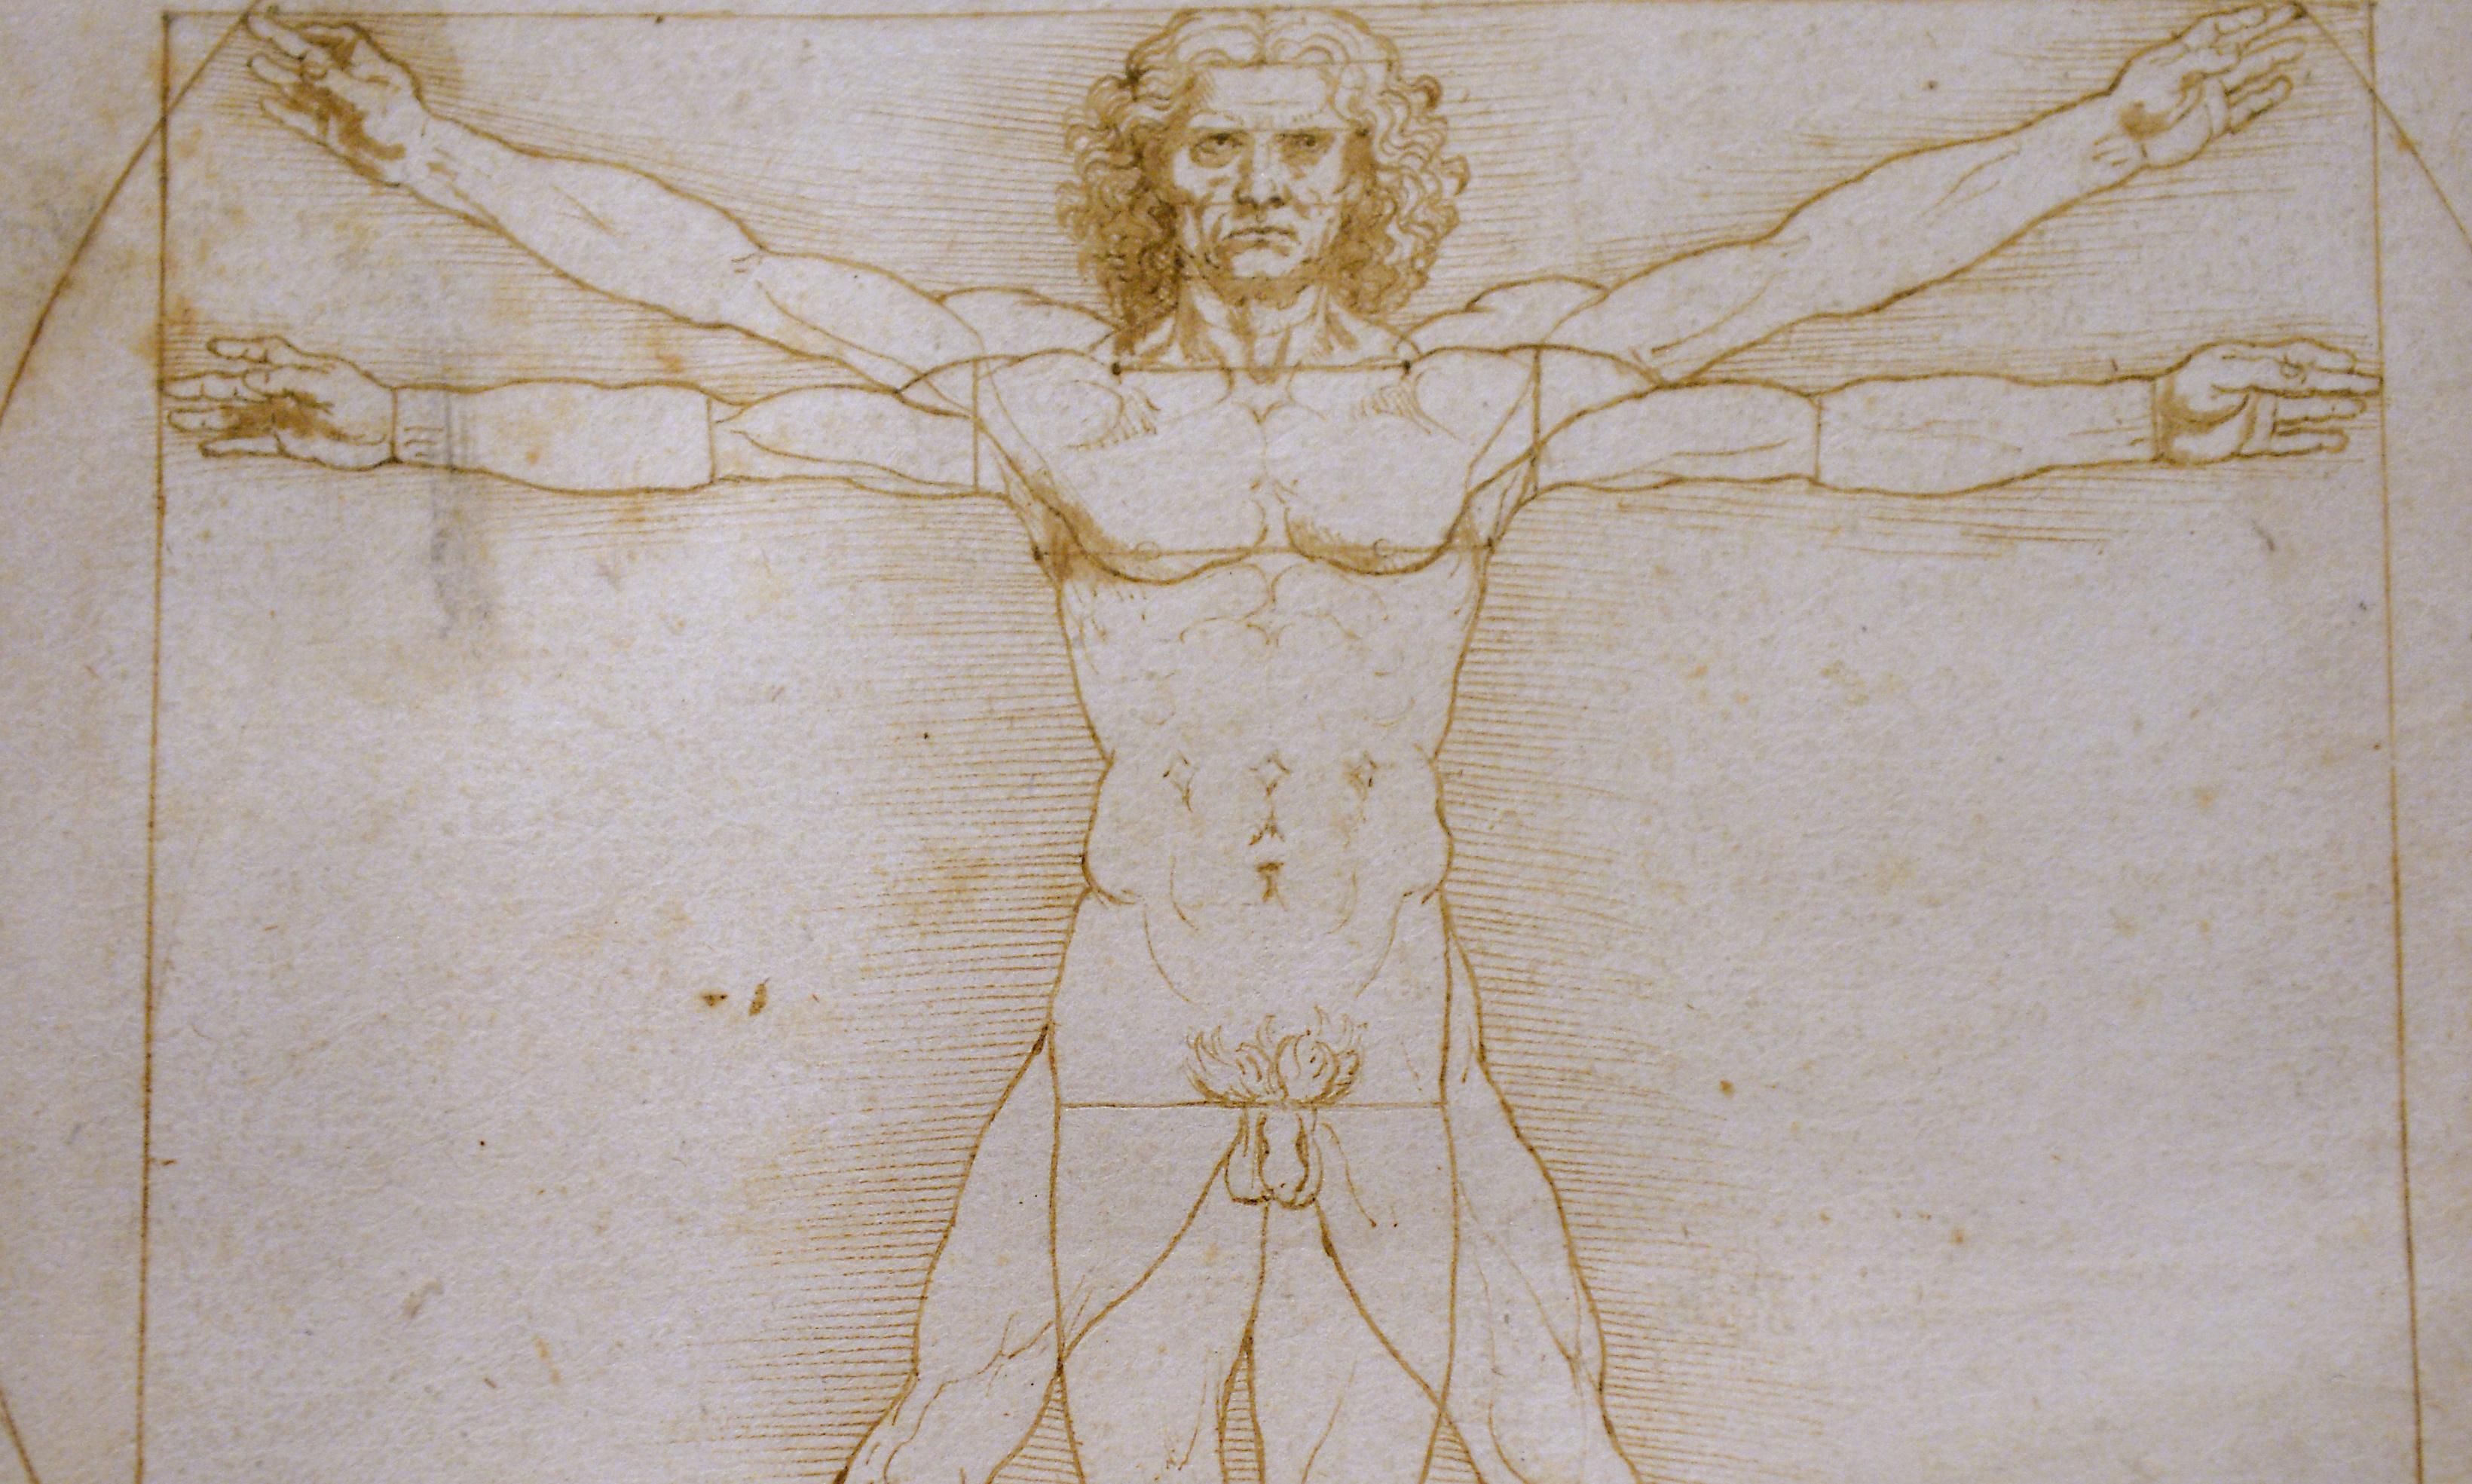 Leonardo da Vinci work 'too fragile' to be transported to France